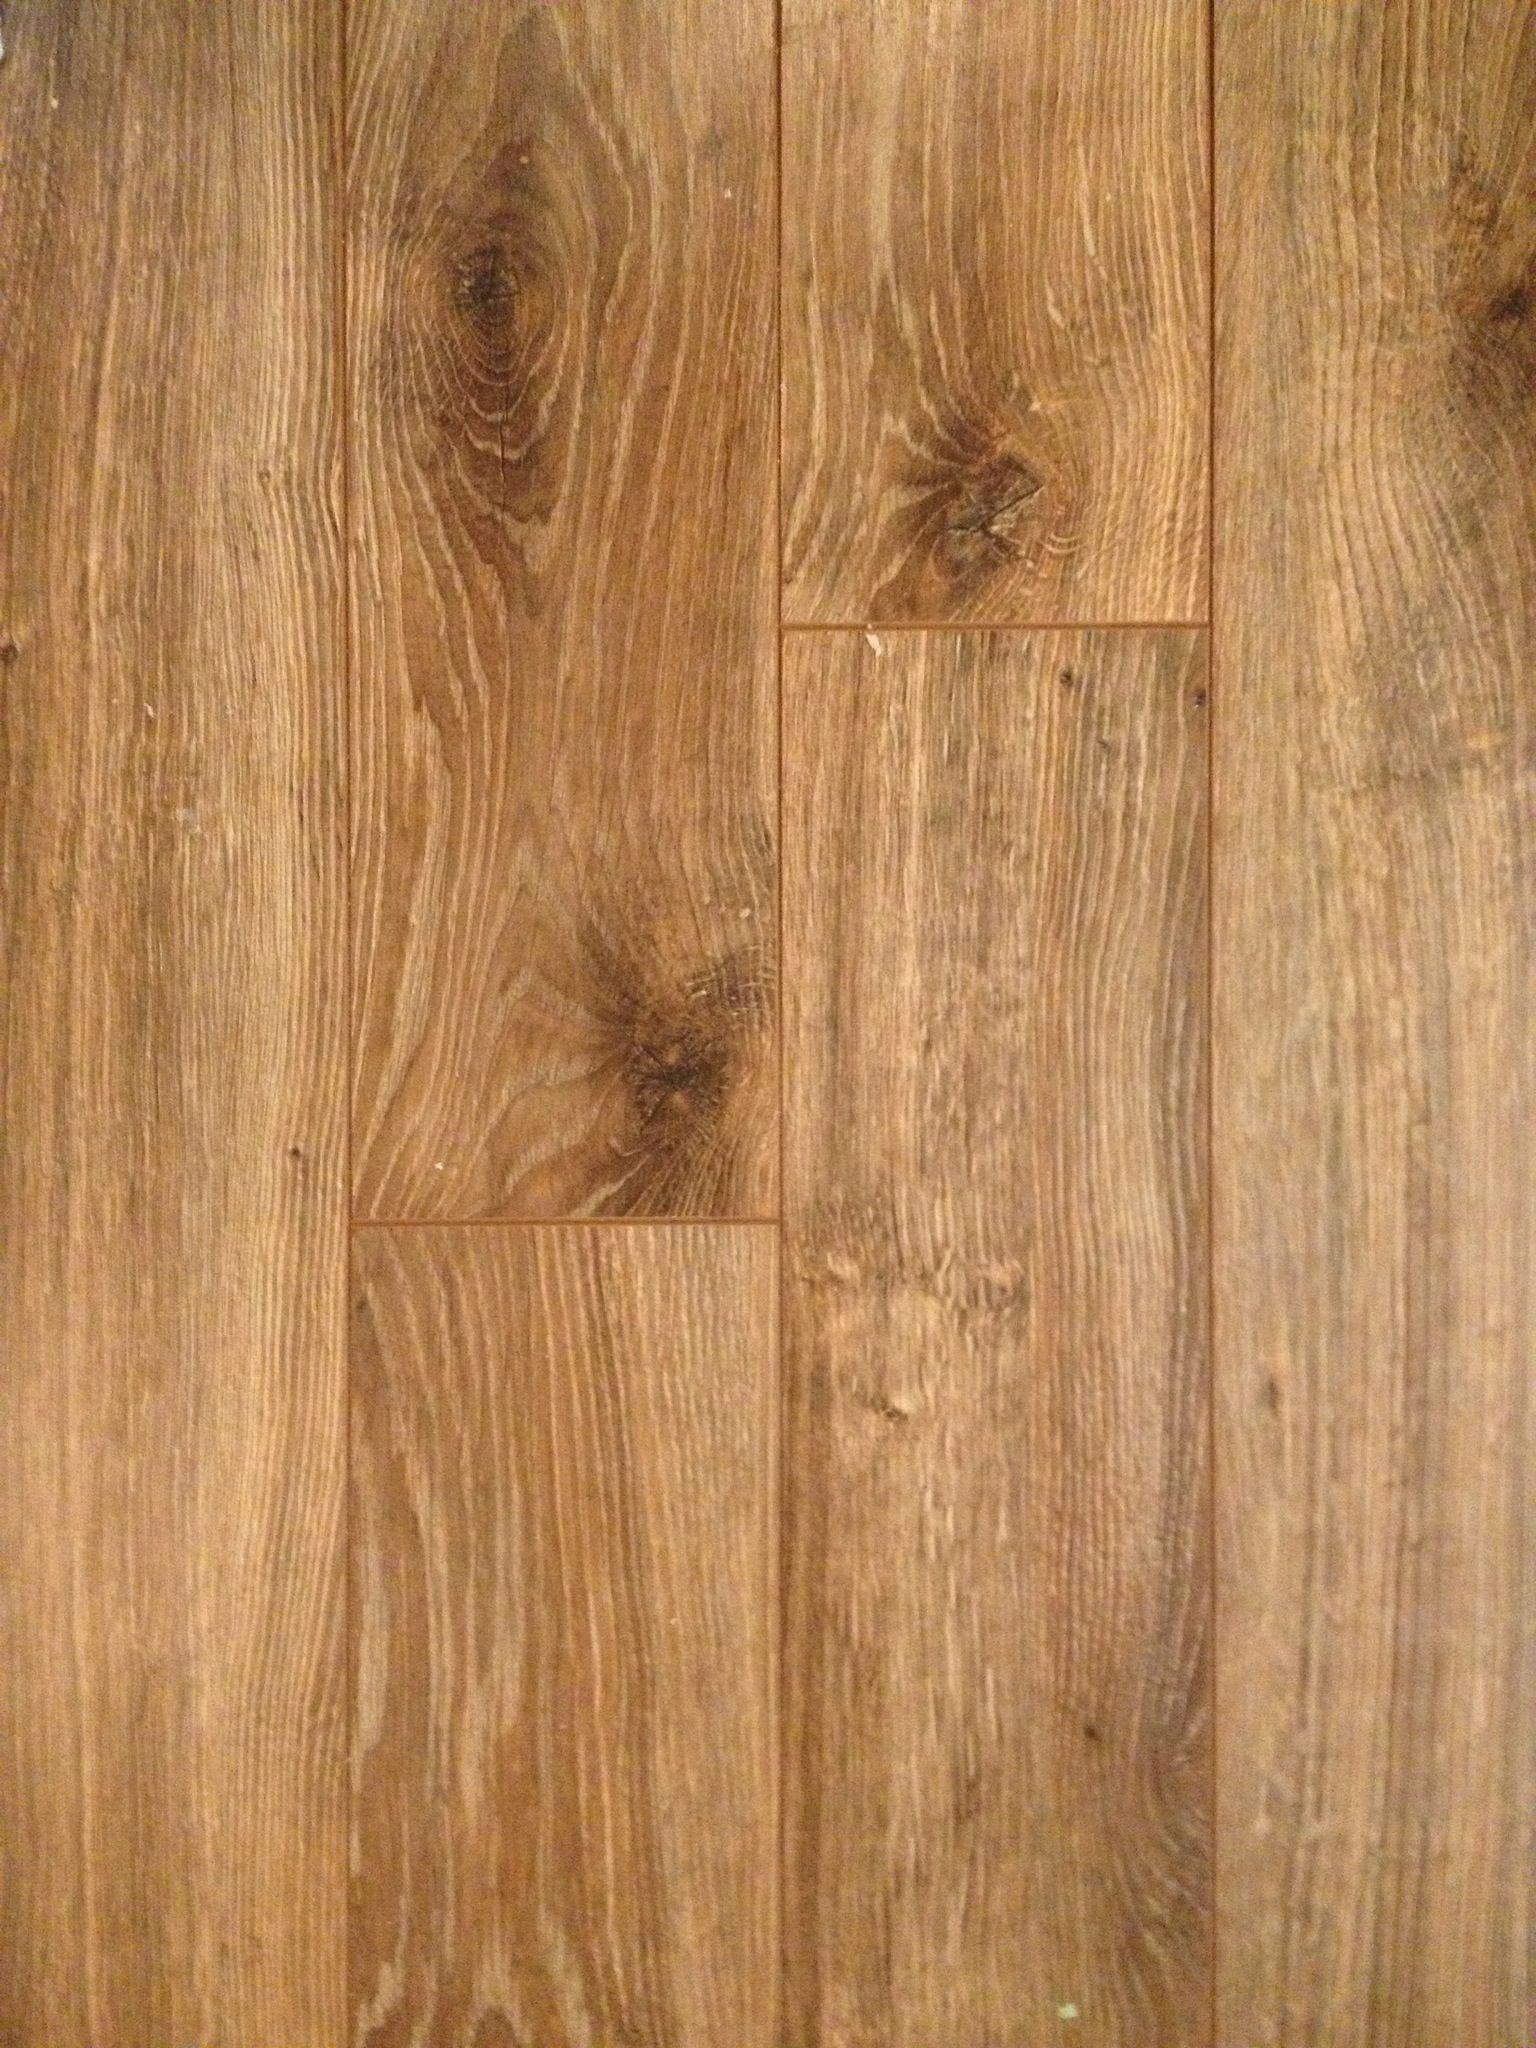 Laminate Flooring On A Concrete Slab